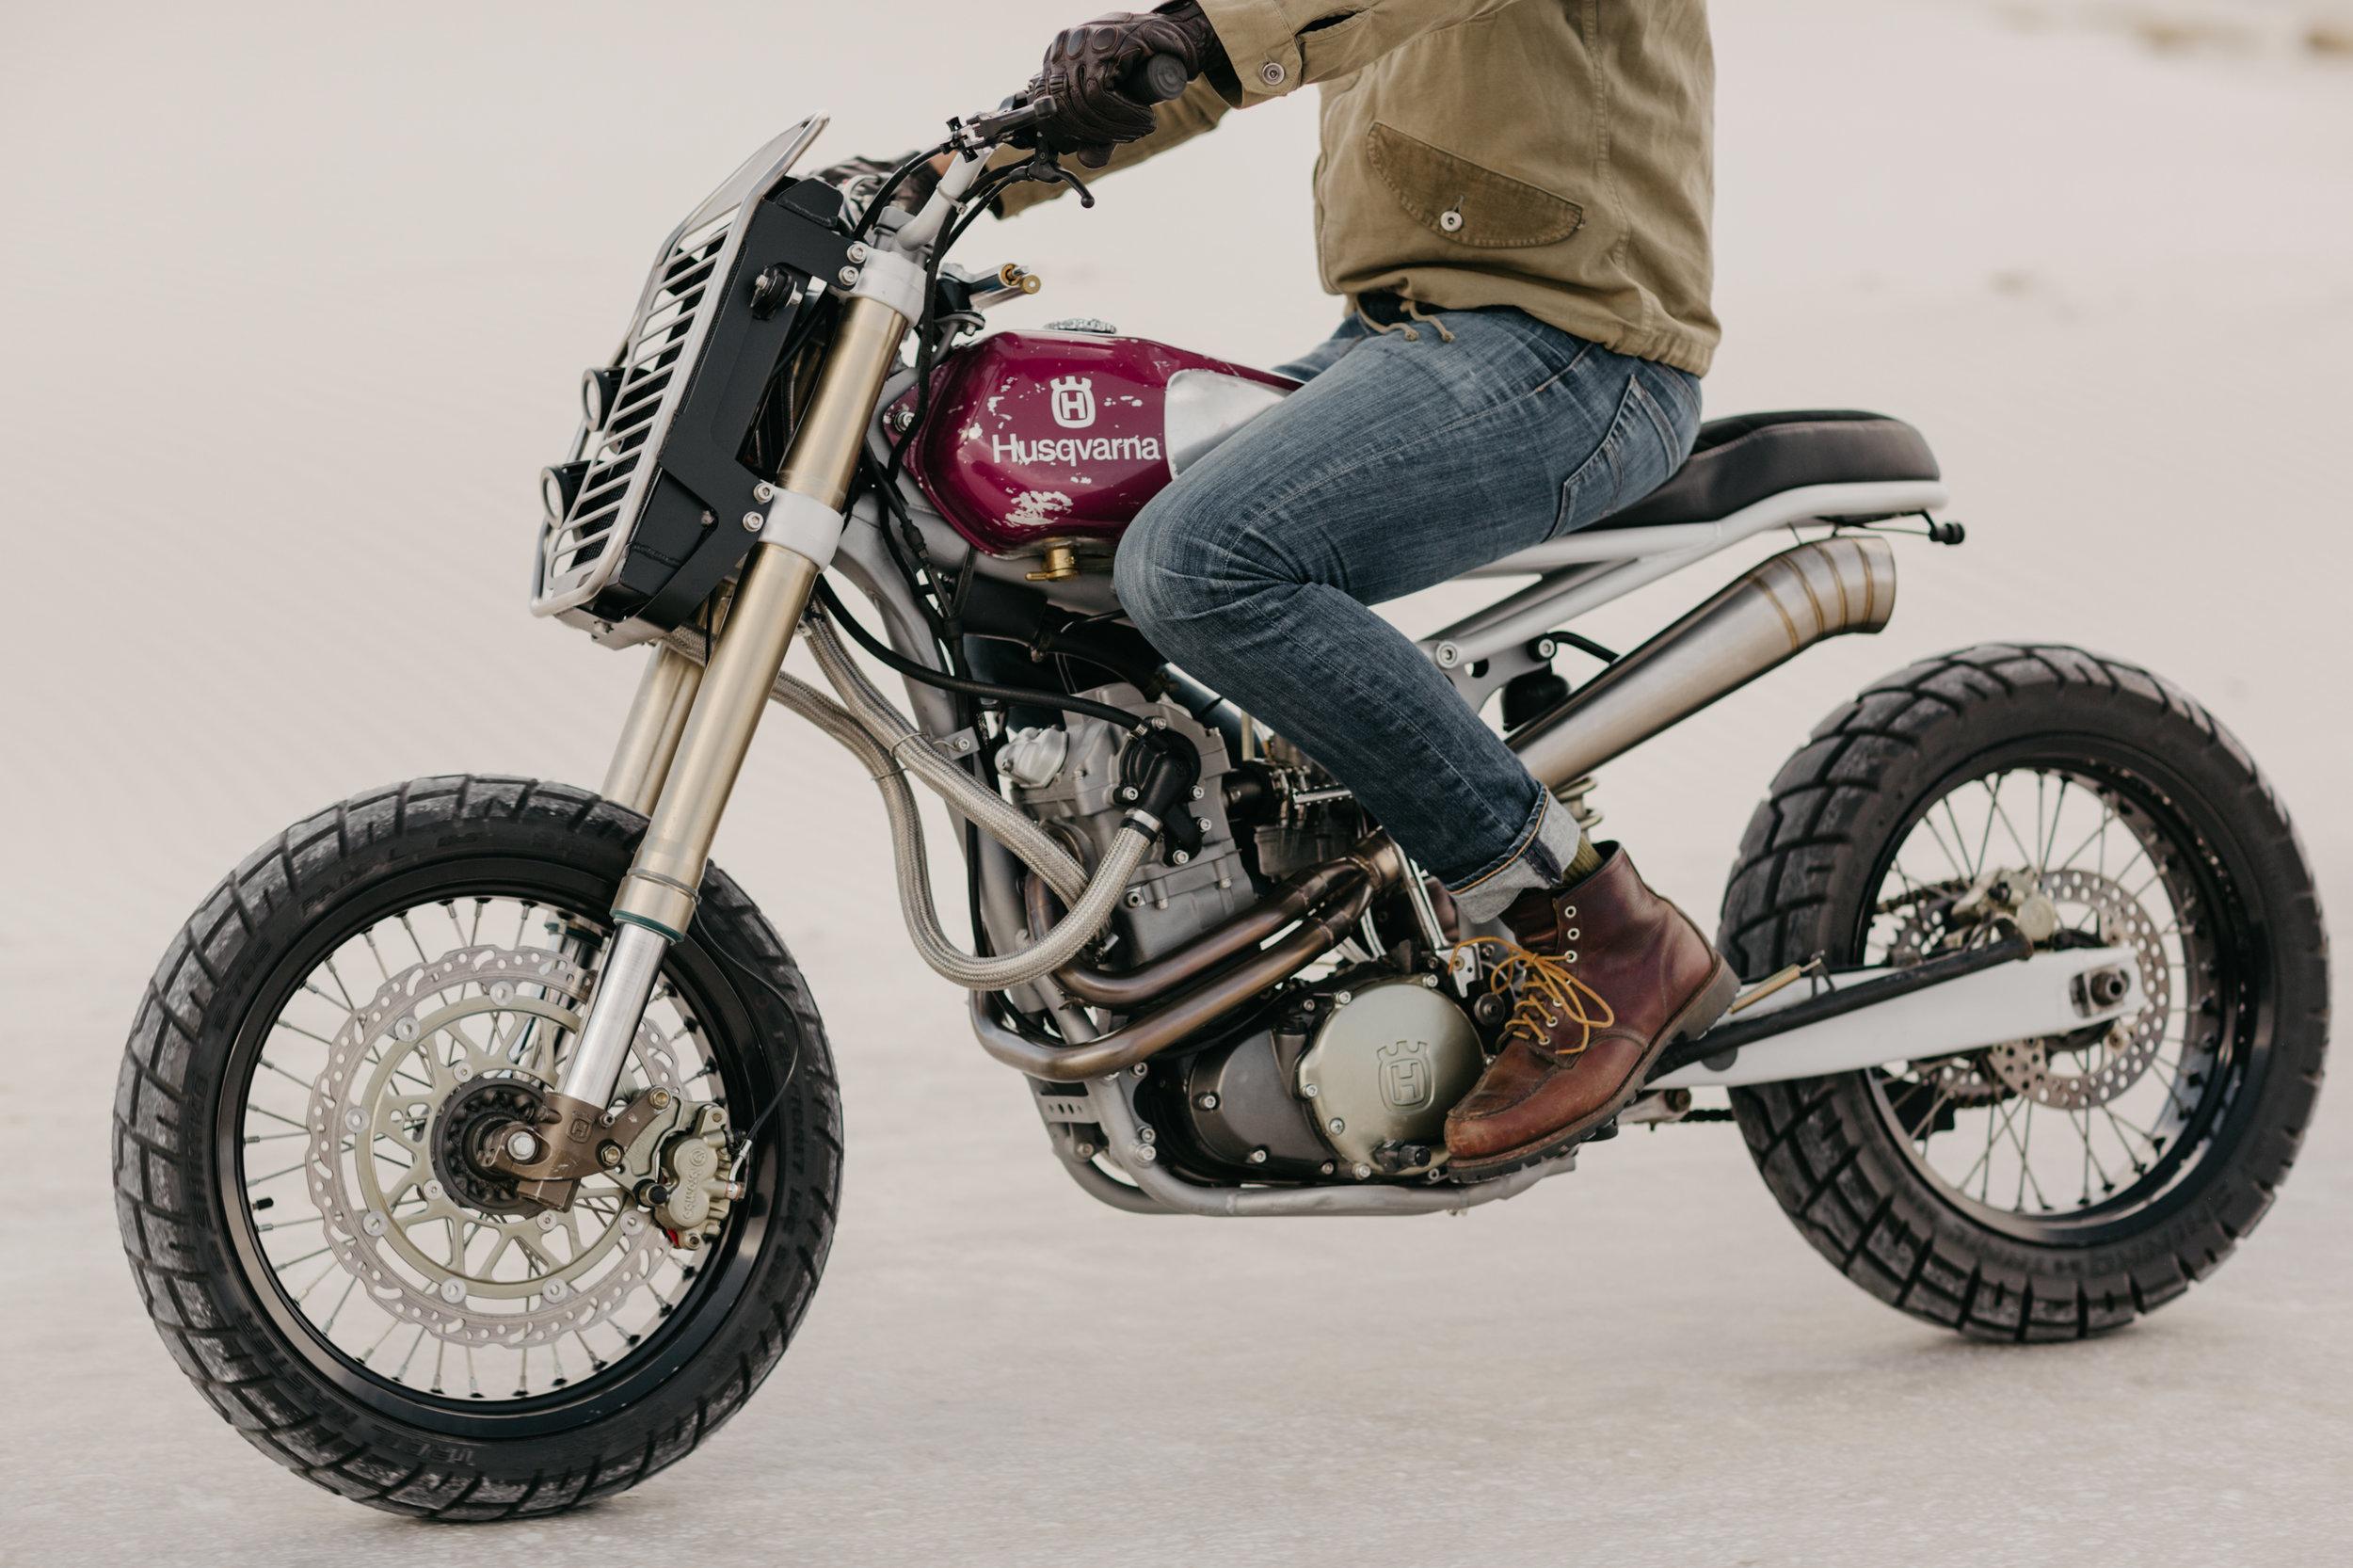 Moto-Mucci_Husqvarna_570_White_Sands (9).JPG